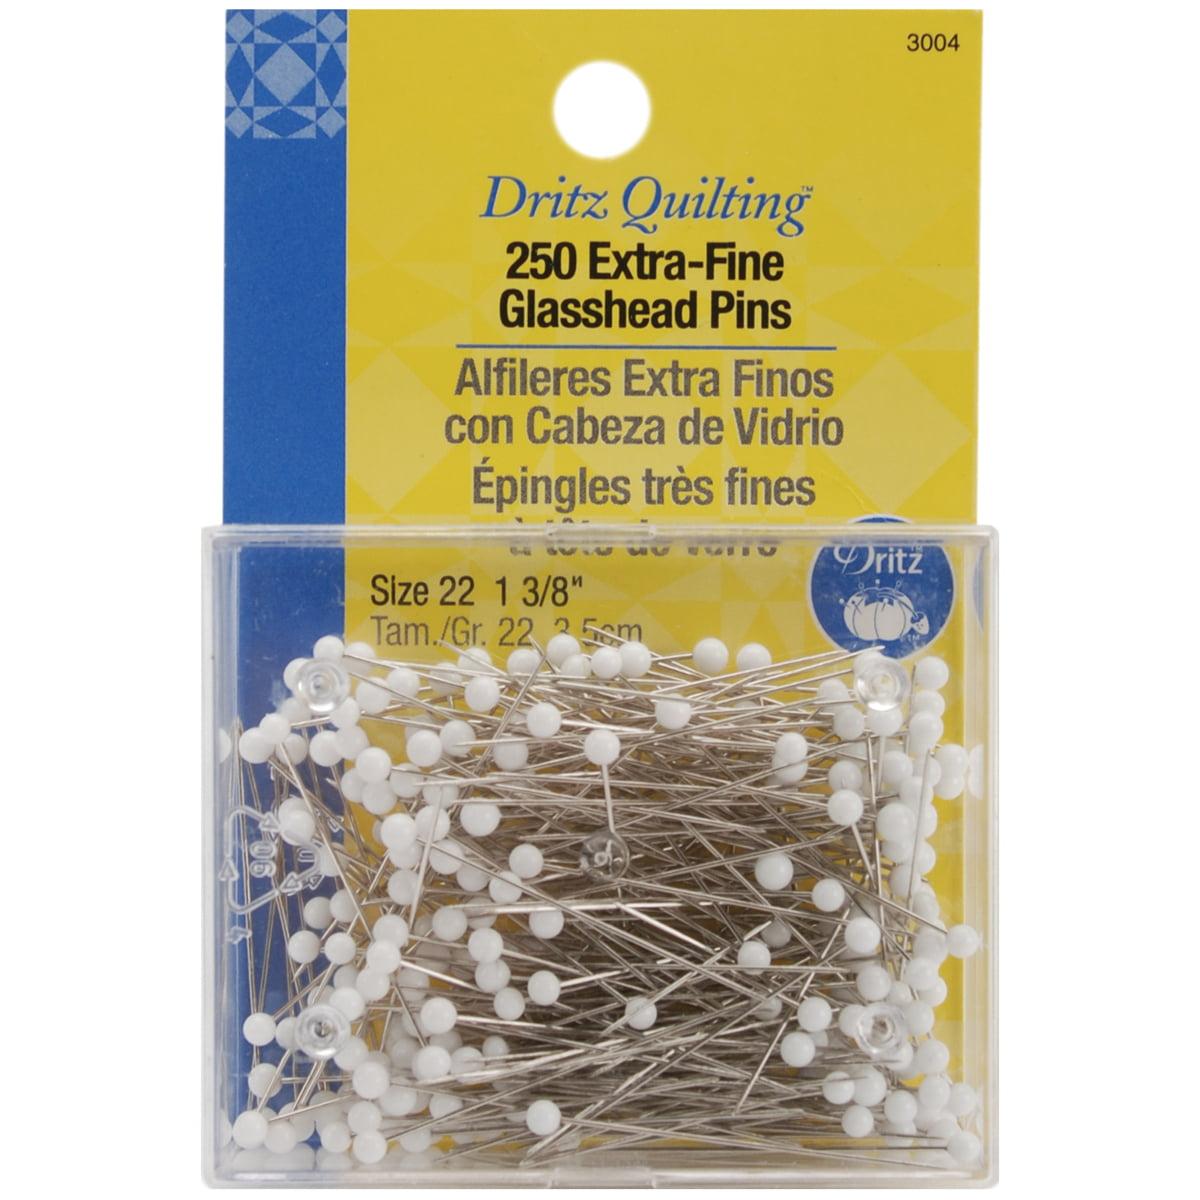 "Dritz Quilting Extra Fine Glasshead Pins, 1-3/8"", 250/pkg"